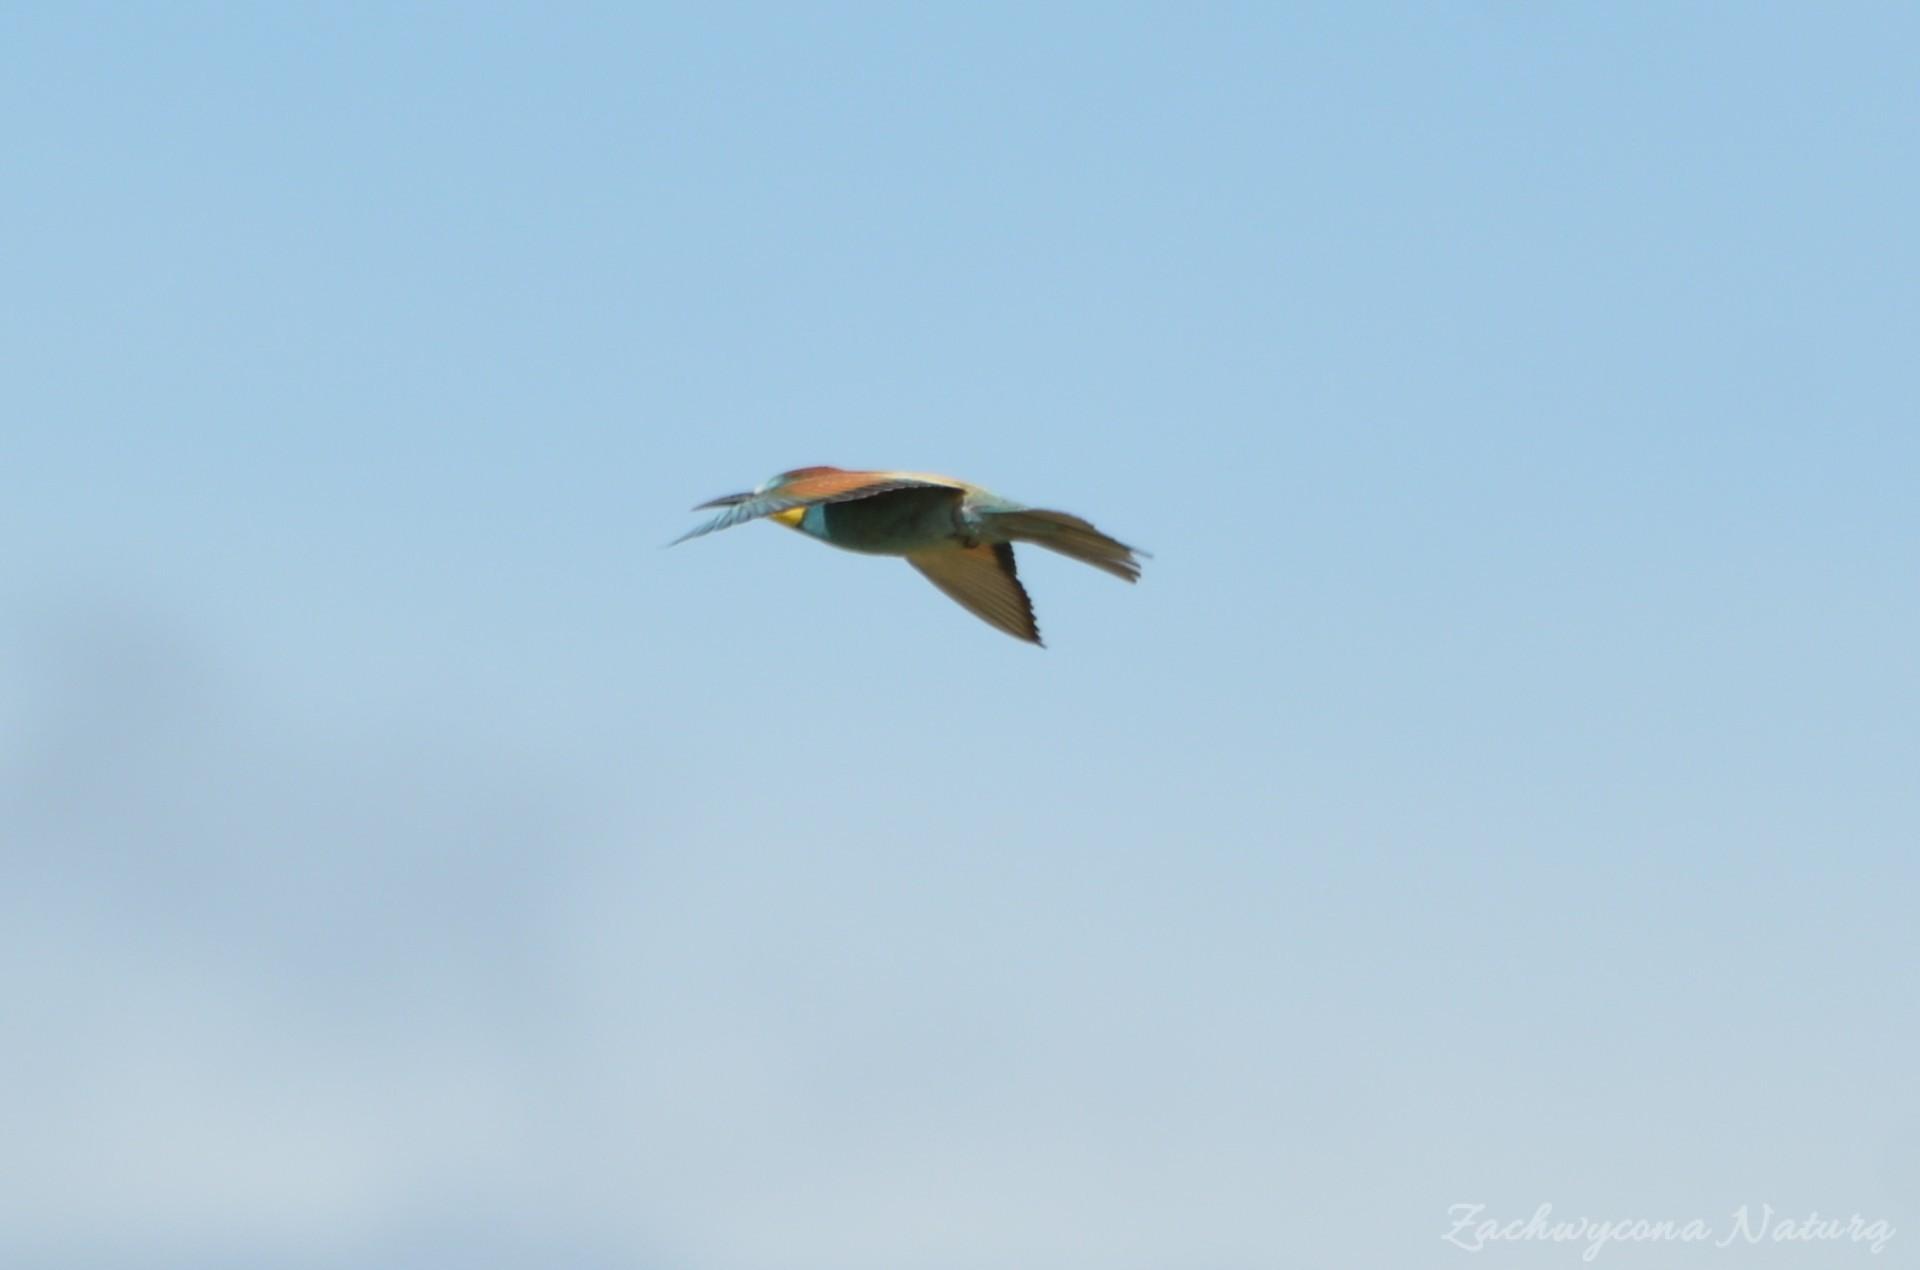 zolna-kolorowa-jak-papuga-merops-apiaster-bee-eater-6